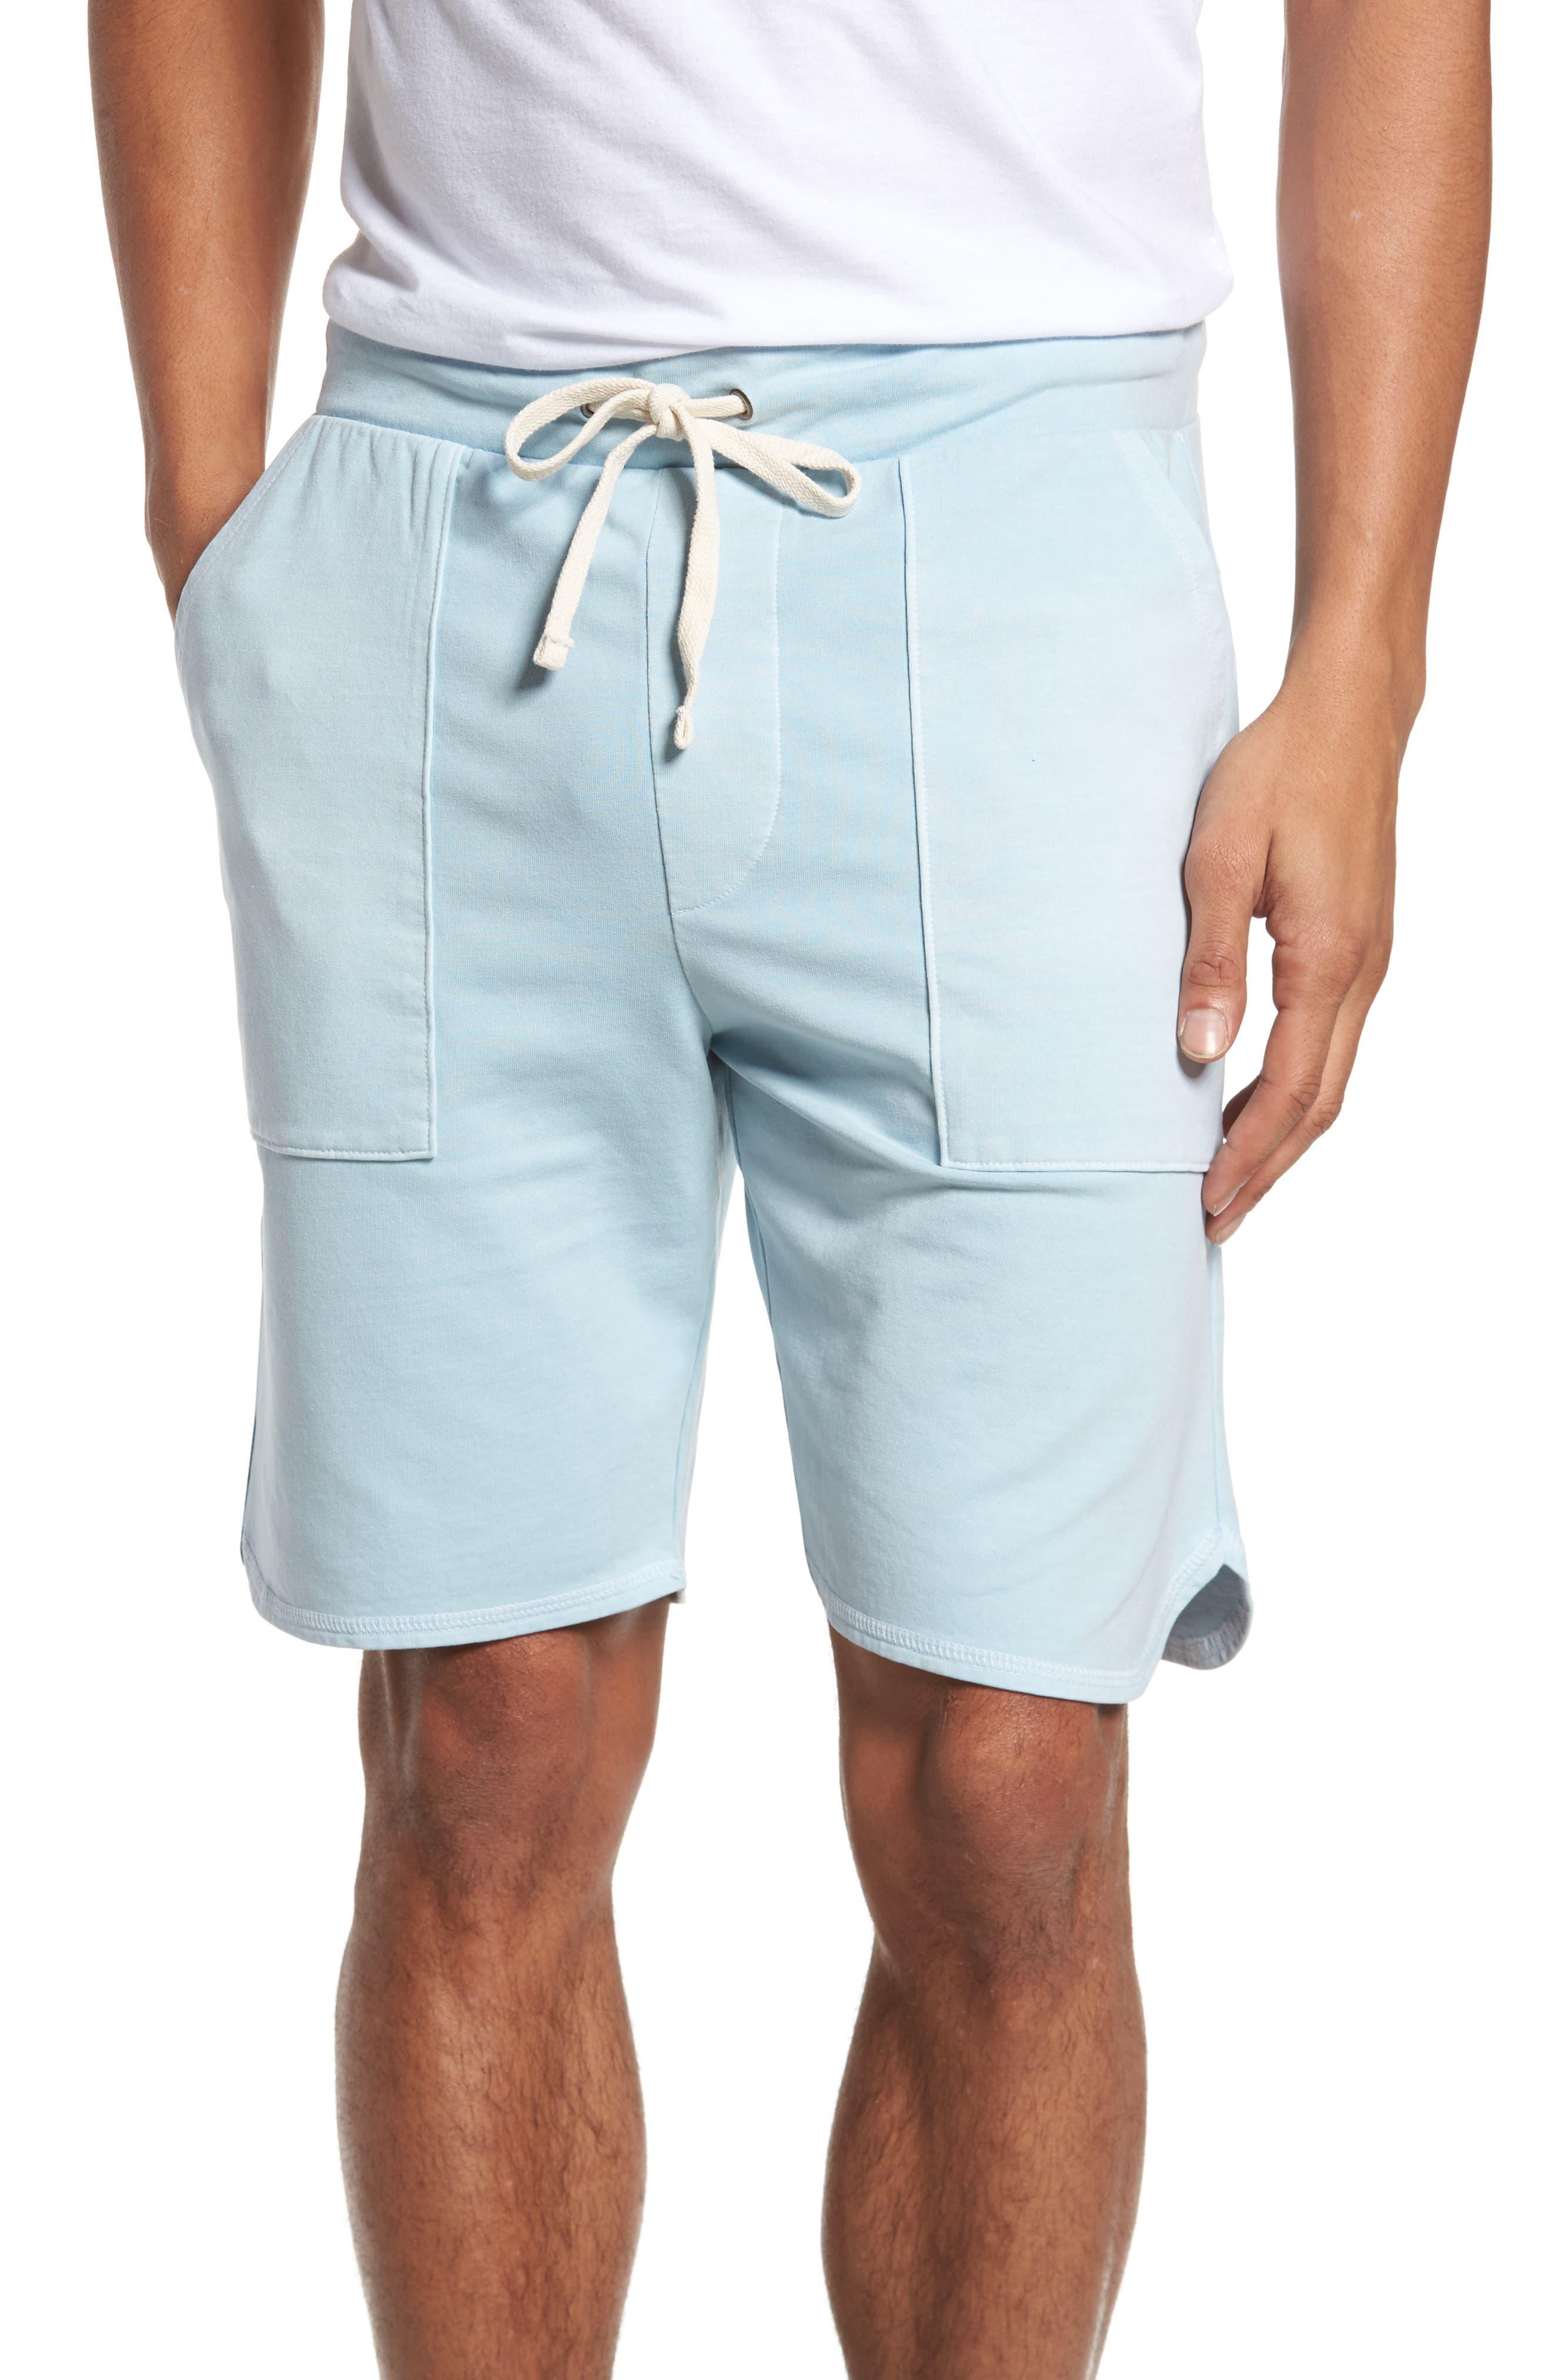 Goodlife Terrycloth Scallop Shorts